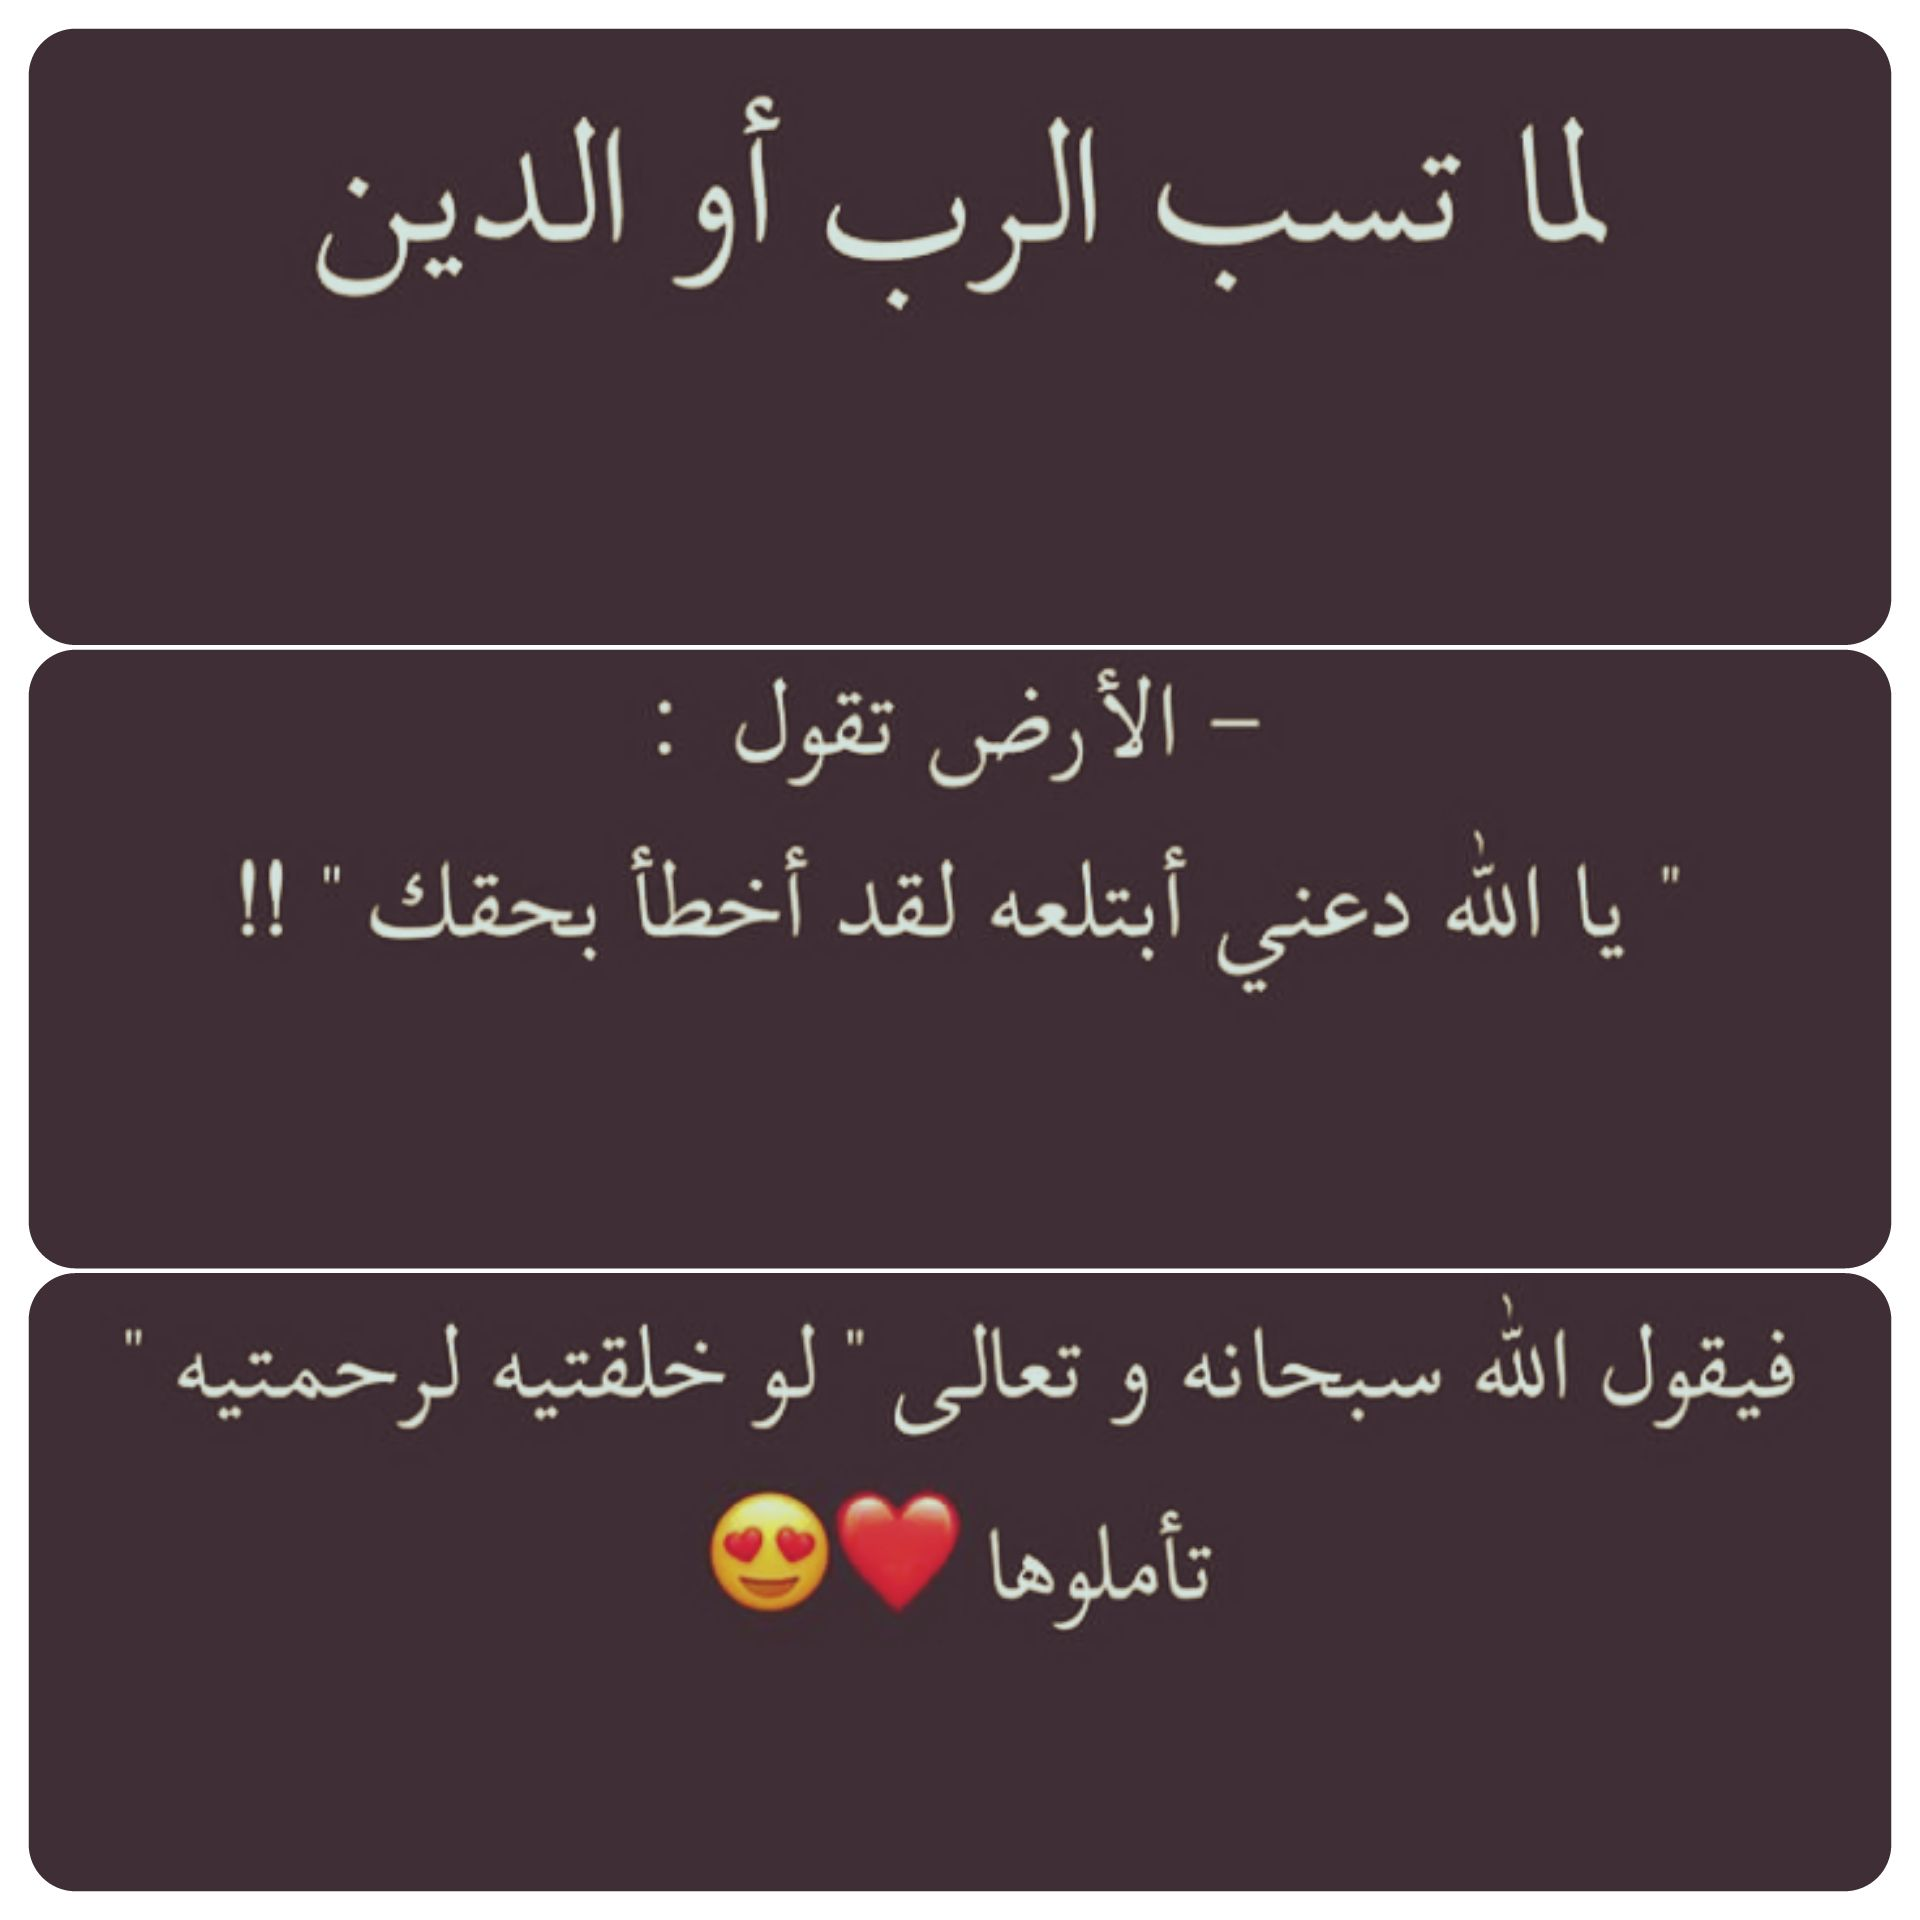 تأملوها Beautiful Words Words Arabic Calligraphy